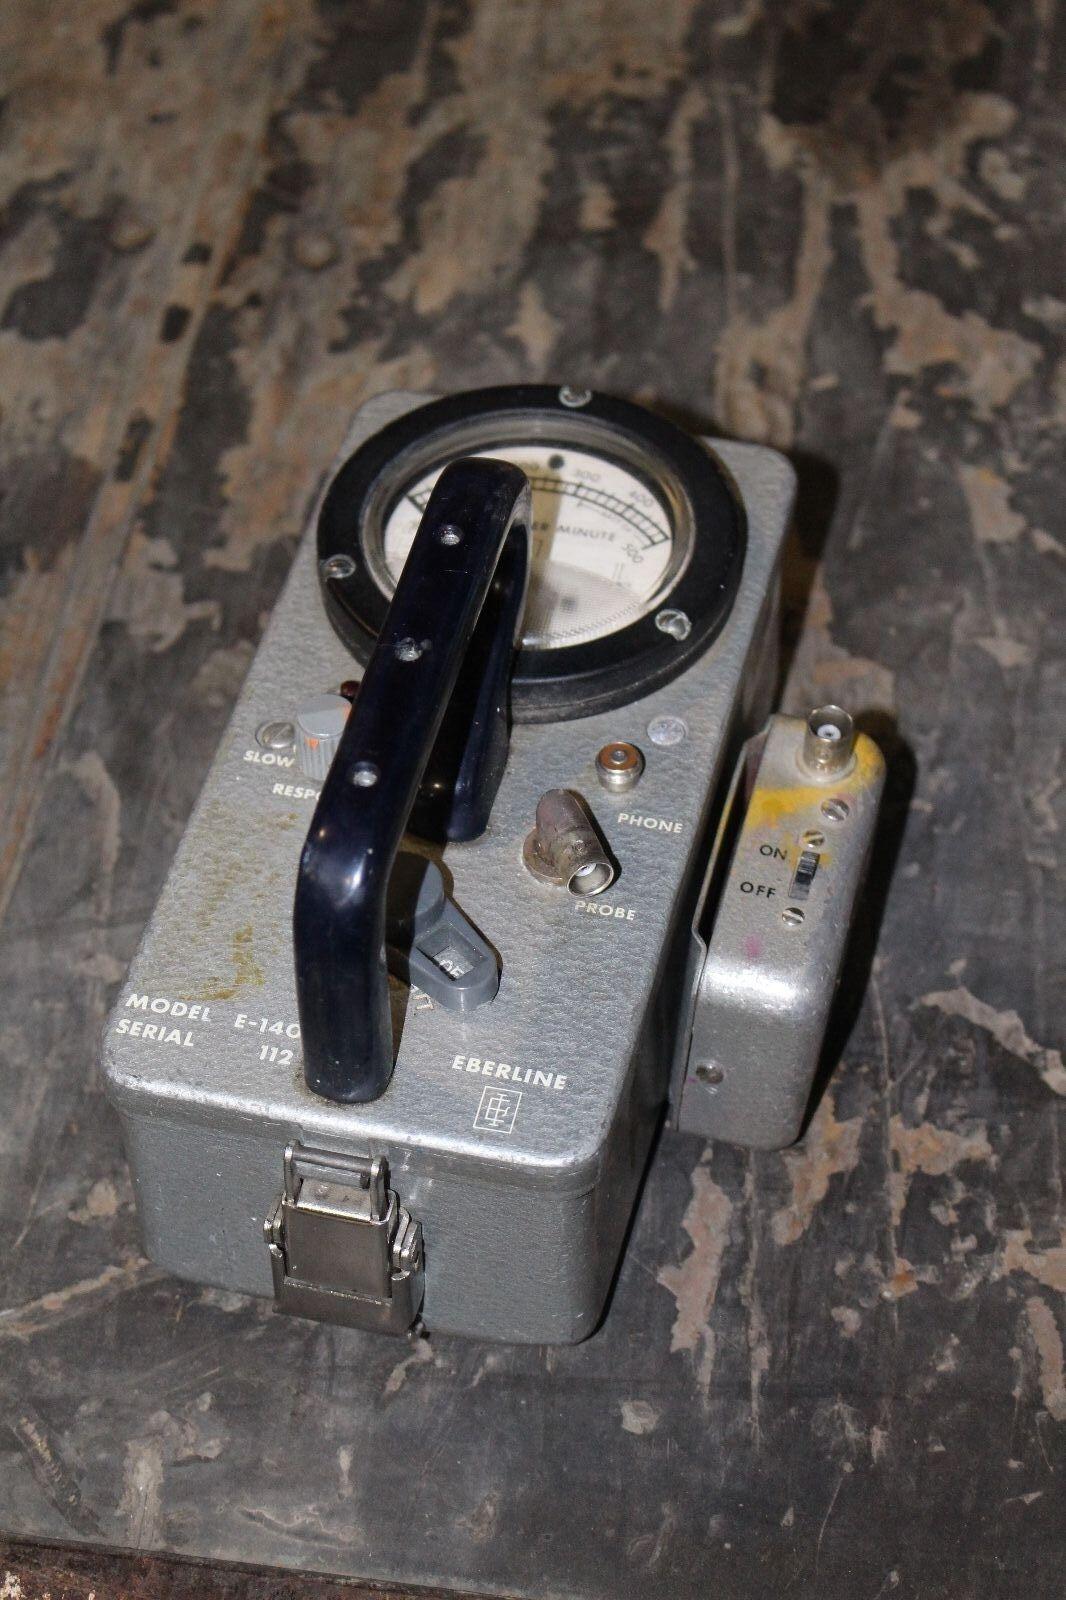 s l1600 - Eberline Geiger Counter Model E-140